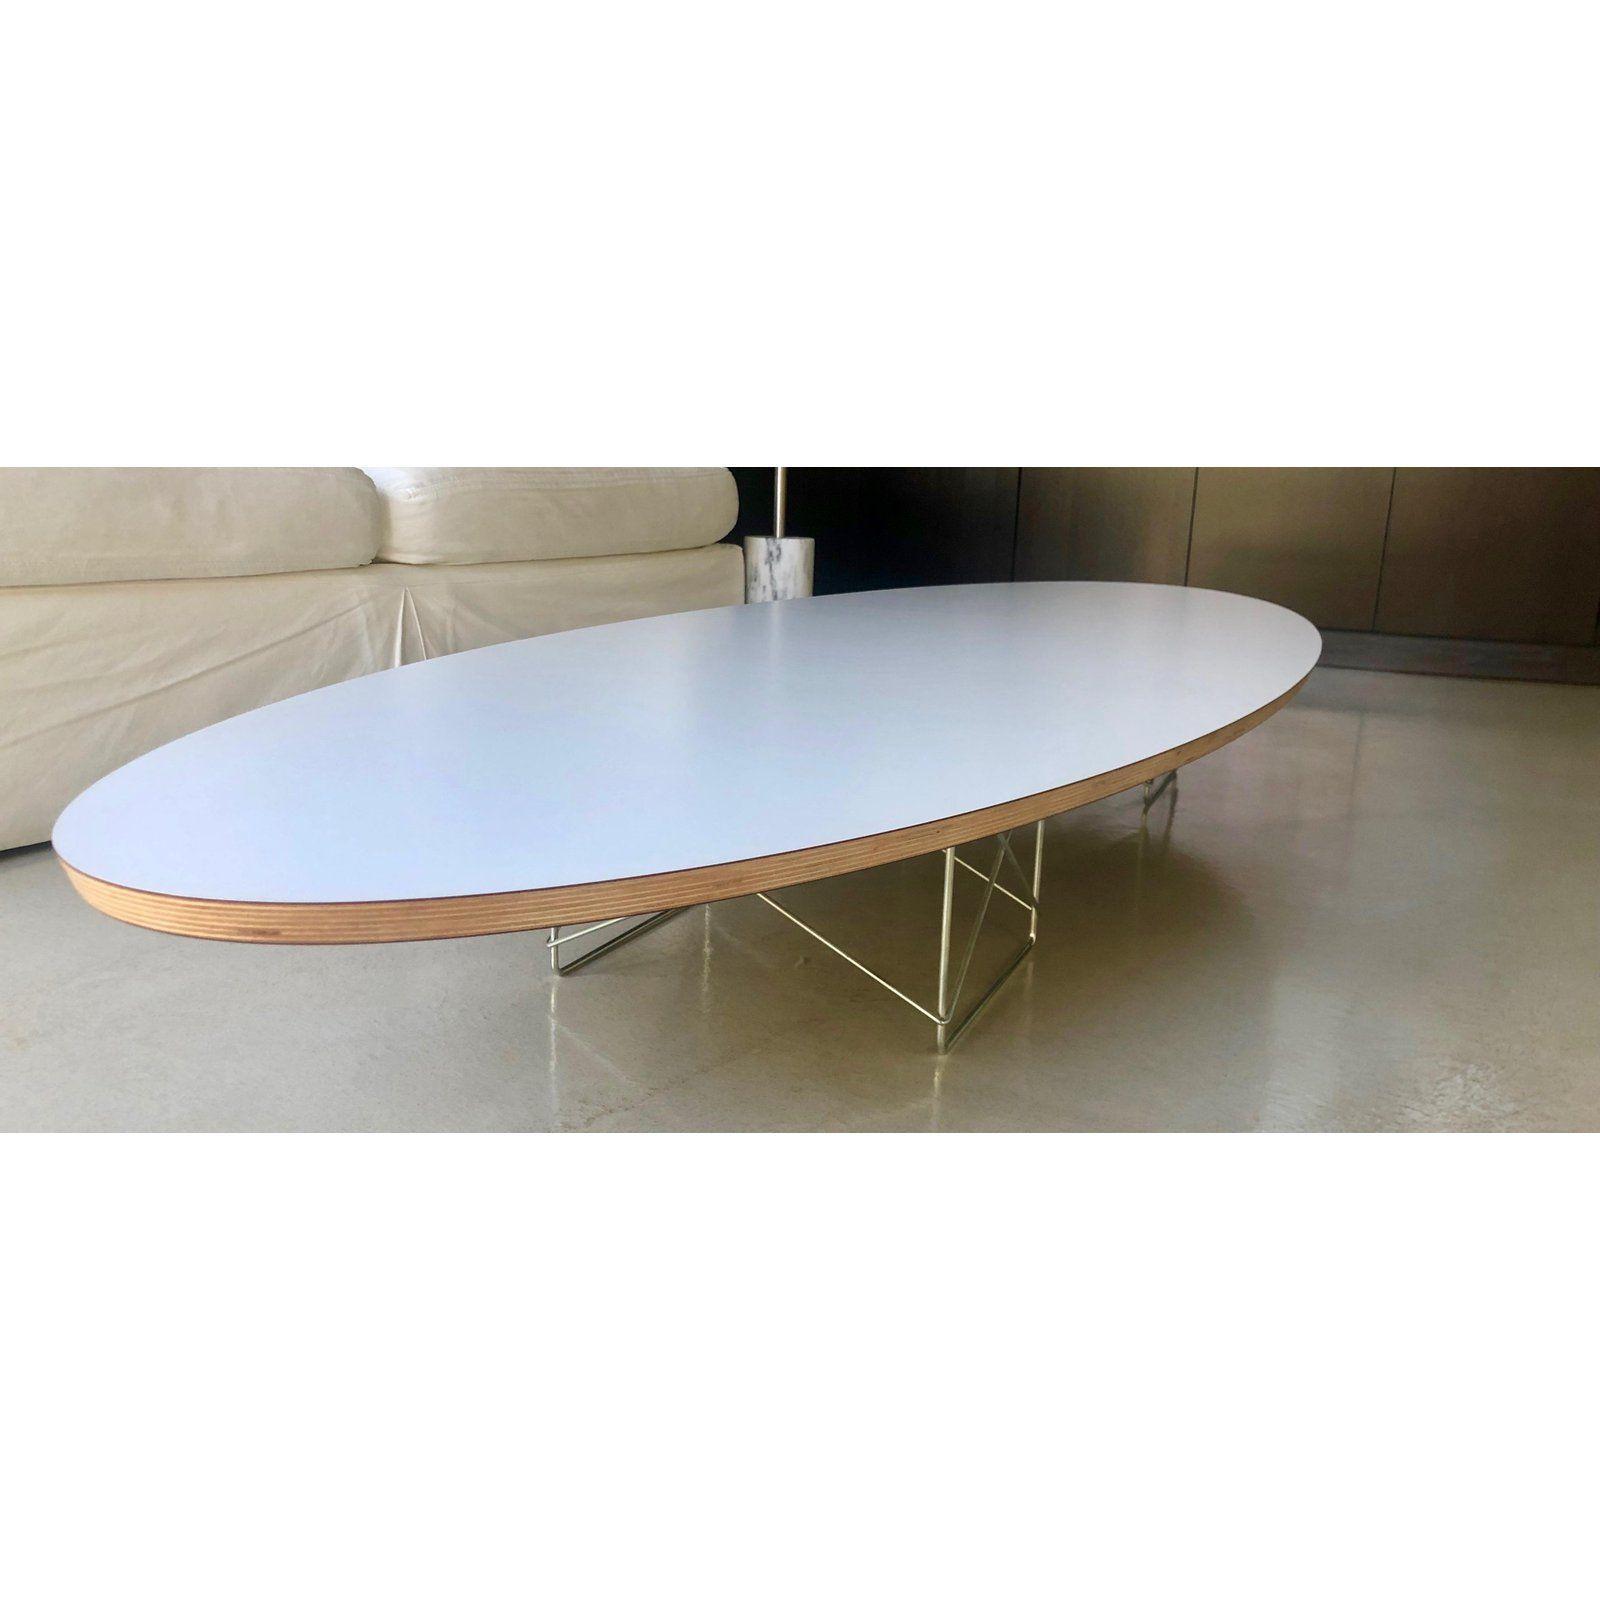 Mid Century Modern Surfboard Table An Elongated Elliptical Coffee Table Chairish Coffee Table Surfboard Table Table [ 1600 x 1600 Pixel ]